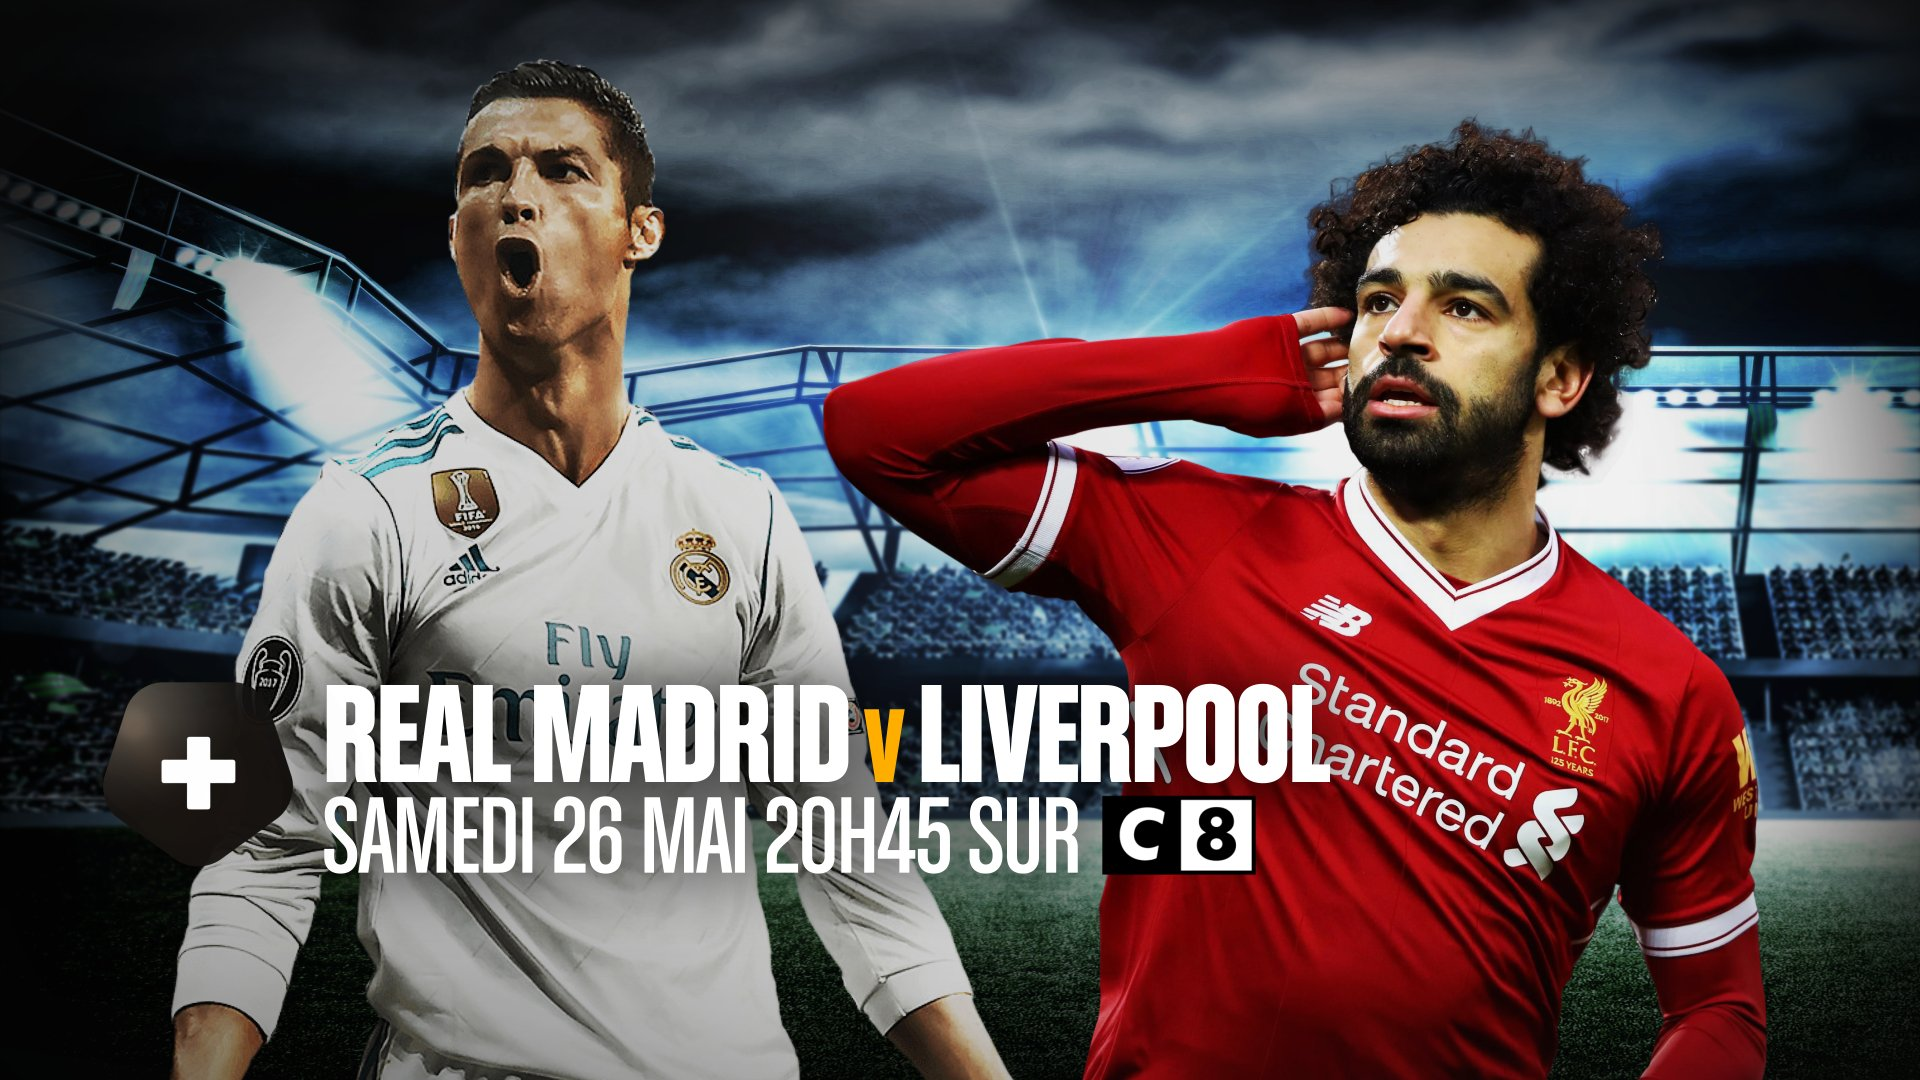 �� : @realmadridfra / @LFCFrance   �� : Finale de la @ChampionsLeague   ��️ : Samedi 26 Mai  �� : @C8TV https://t.co/NTX5zsSIpl